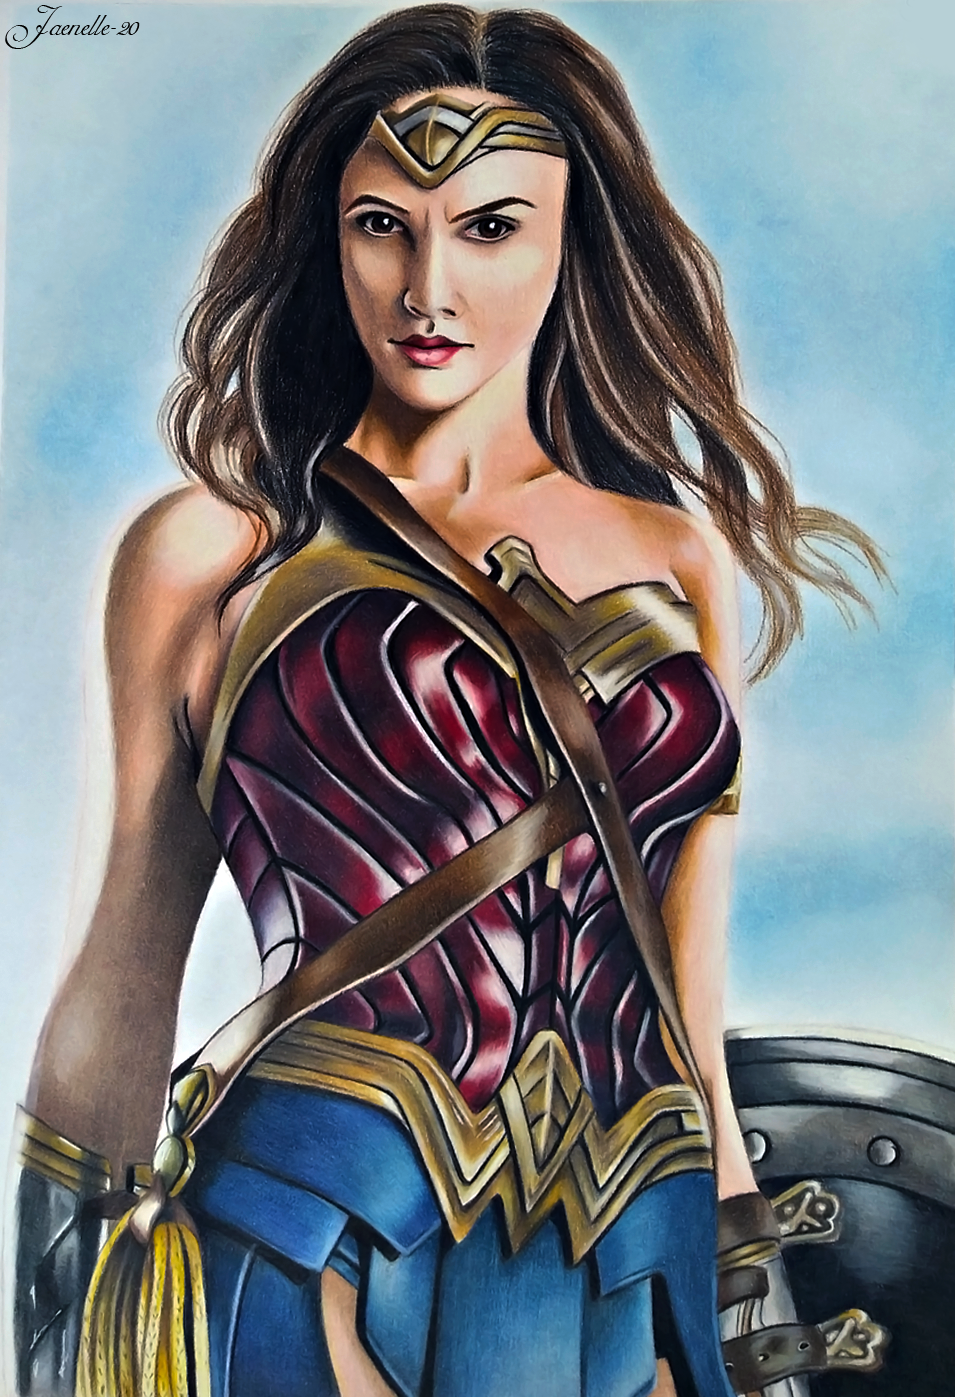 Wonder Woman By Jaenelle 20 On Deviantart Wonder Woman Wonder Manga Studio